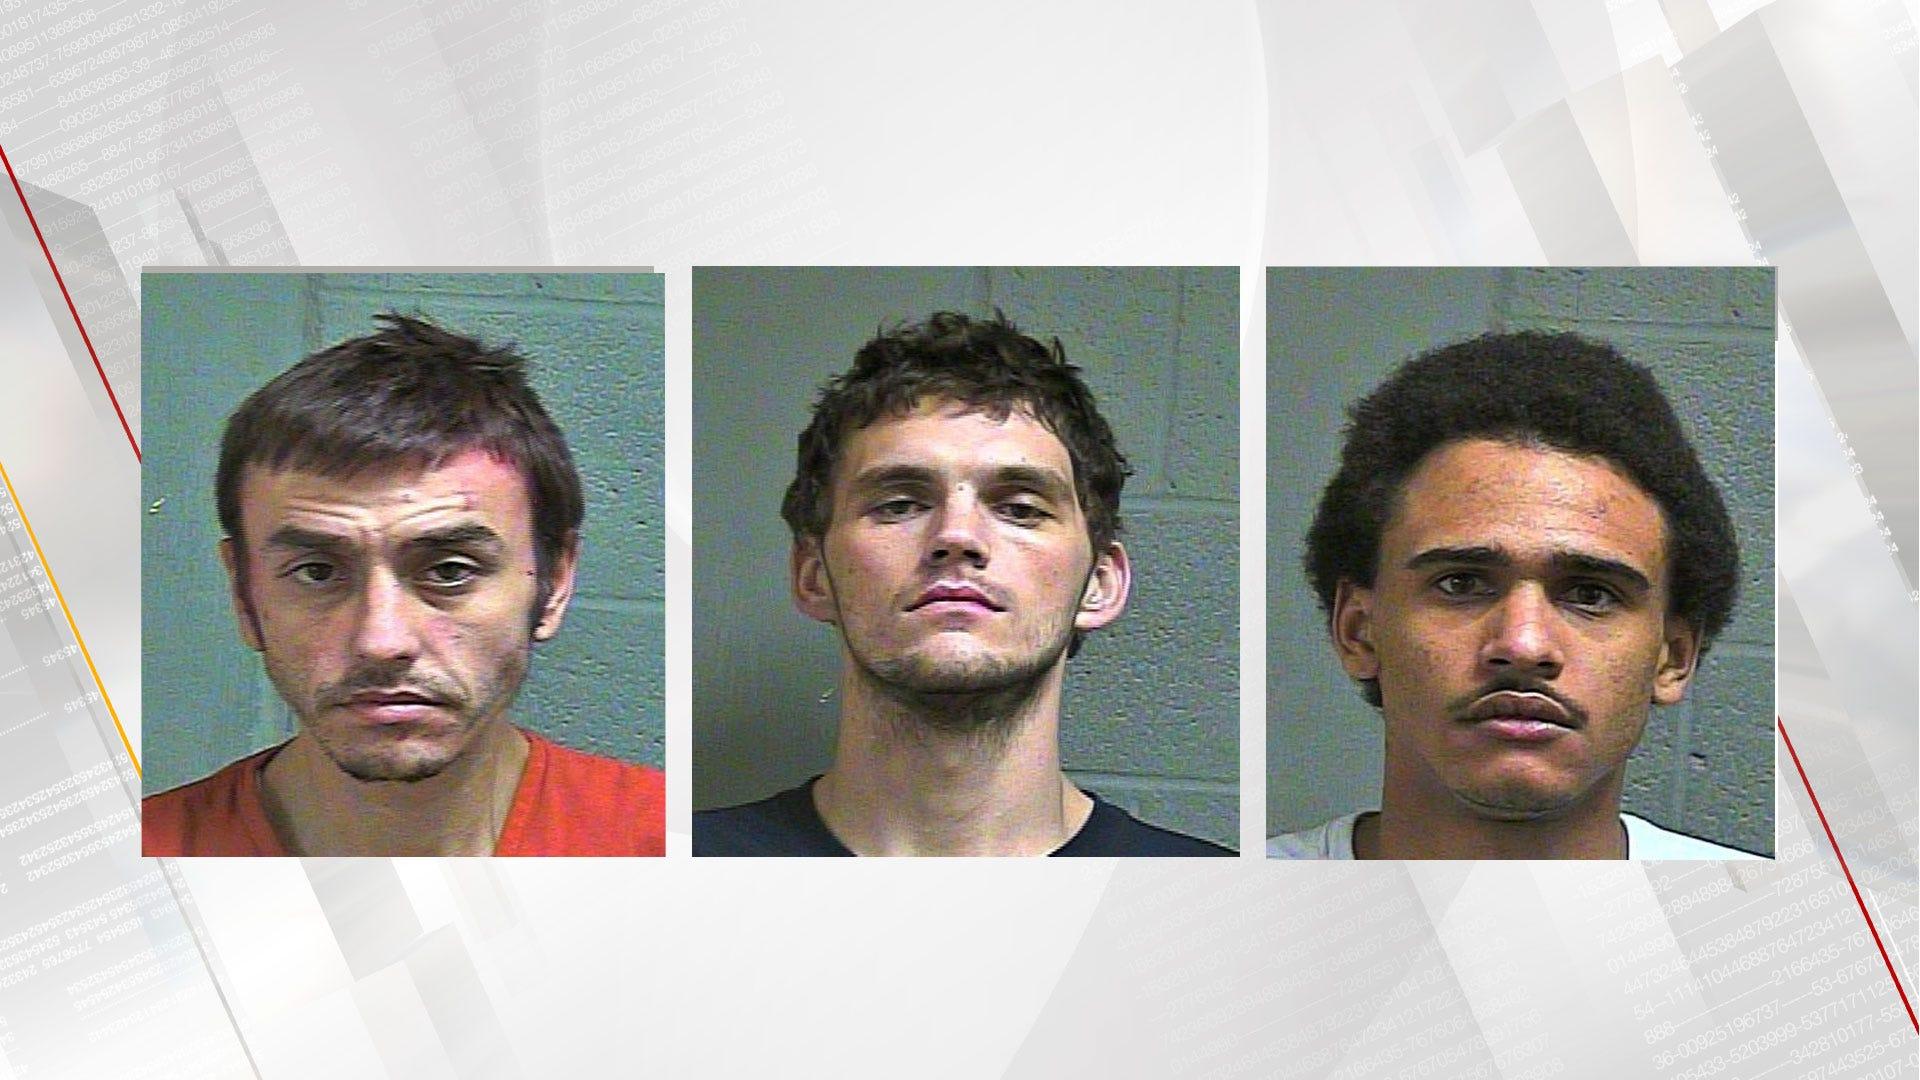 3 Suspects Taken Into Custody After Fleeing Traffic Stop In SW OKC